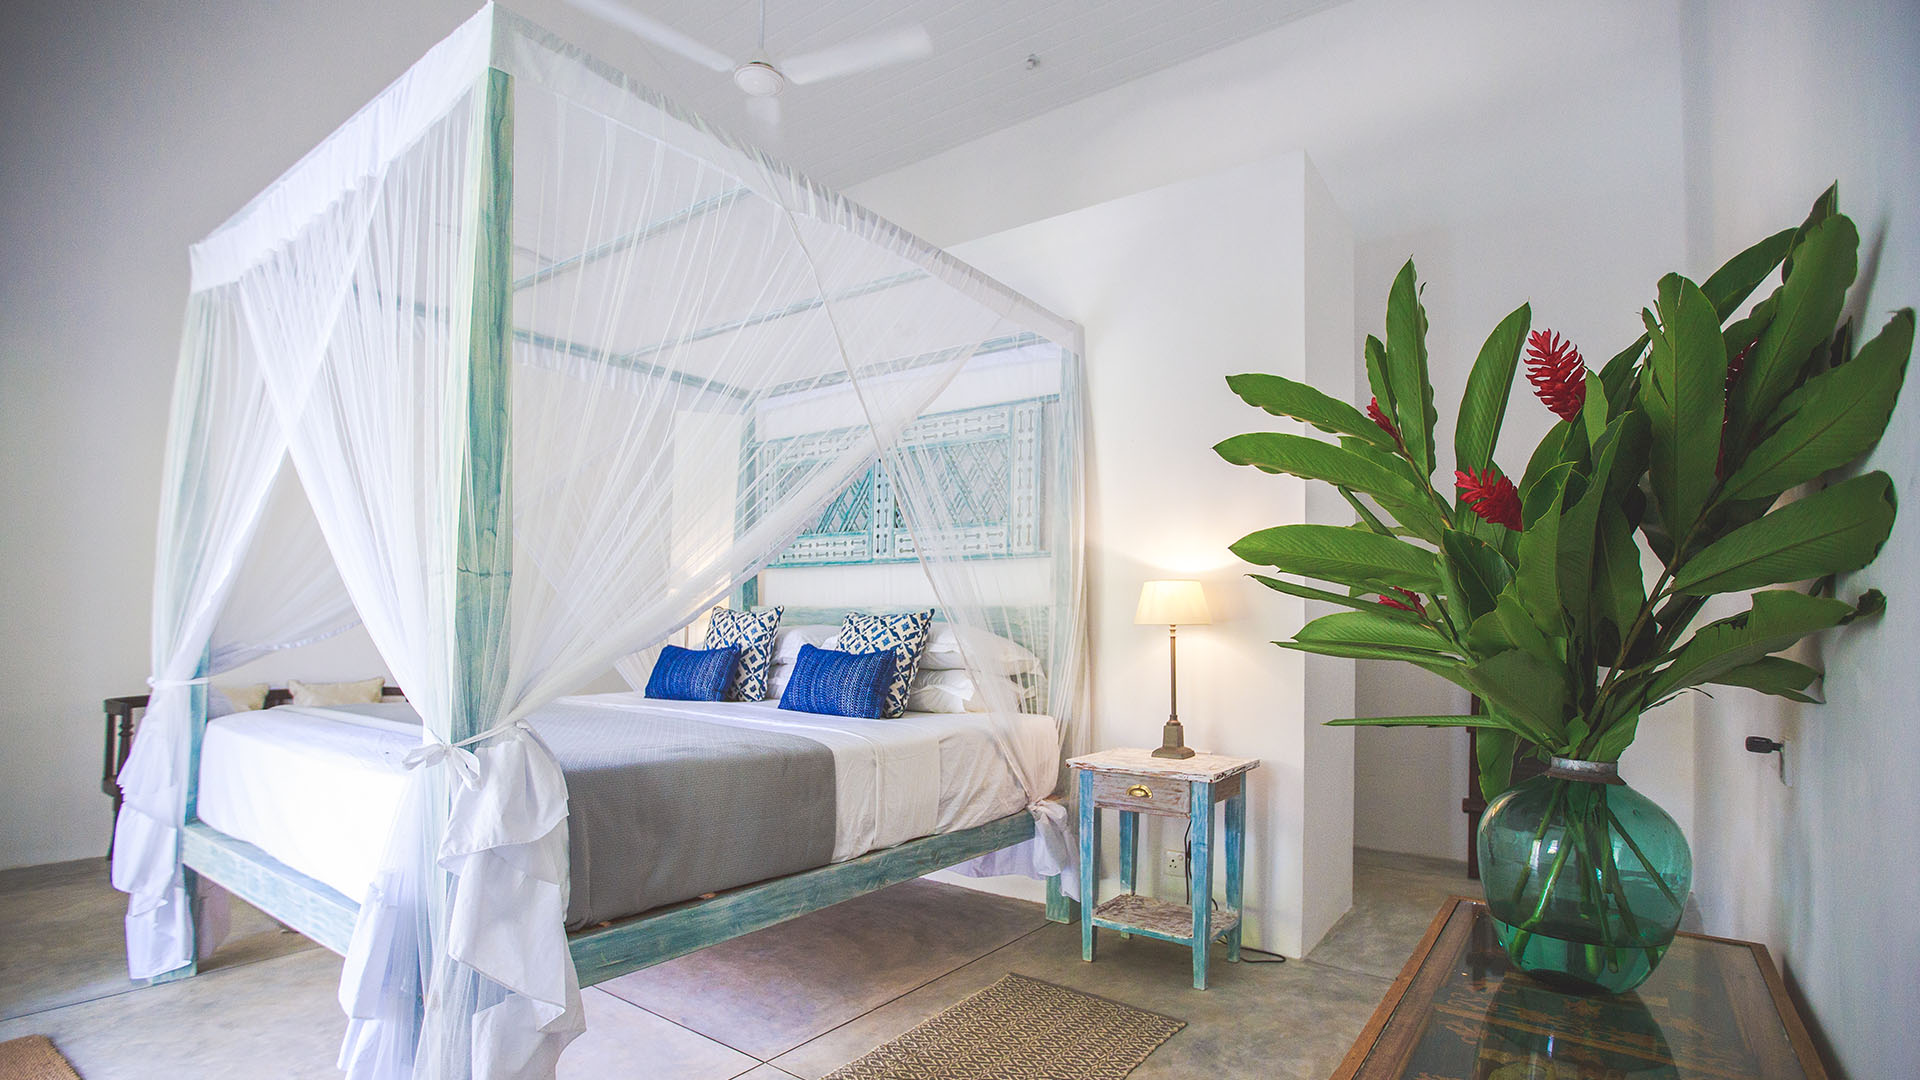 Sri_lanka_holiday_villa_sissila_grand_suite1Sri_lanka_holiday_villa_sissila_grand_suite_05.jpg